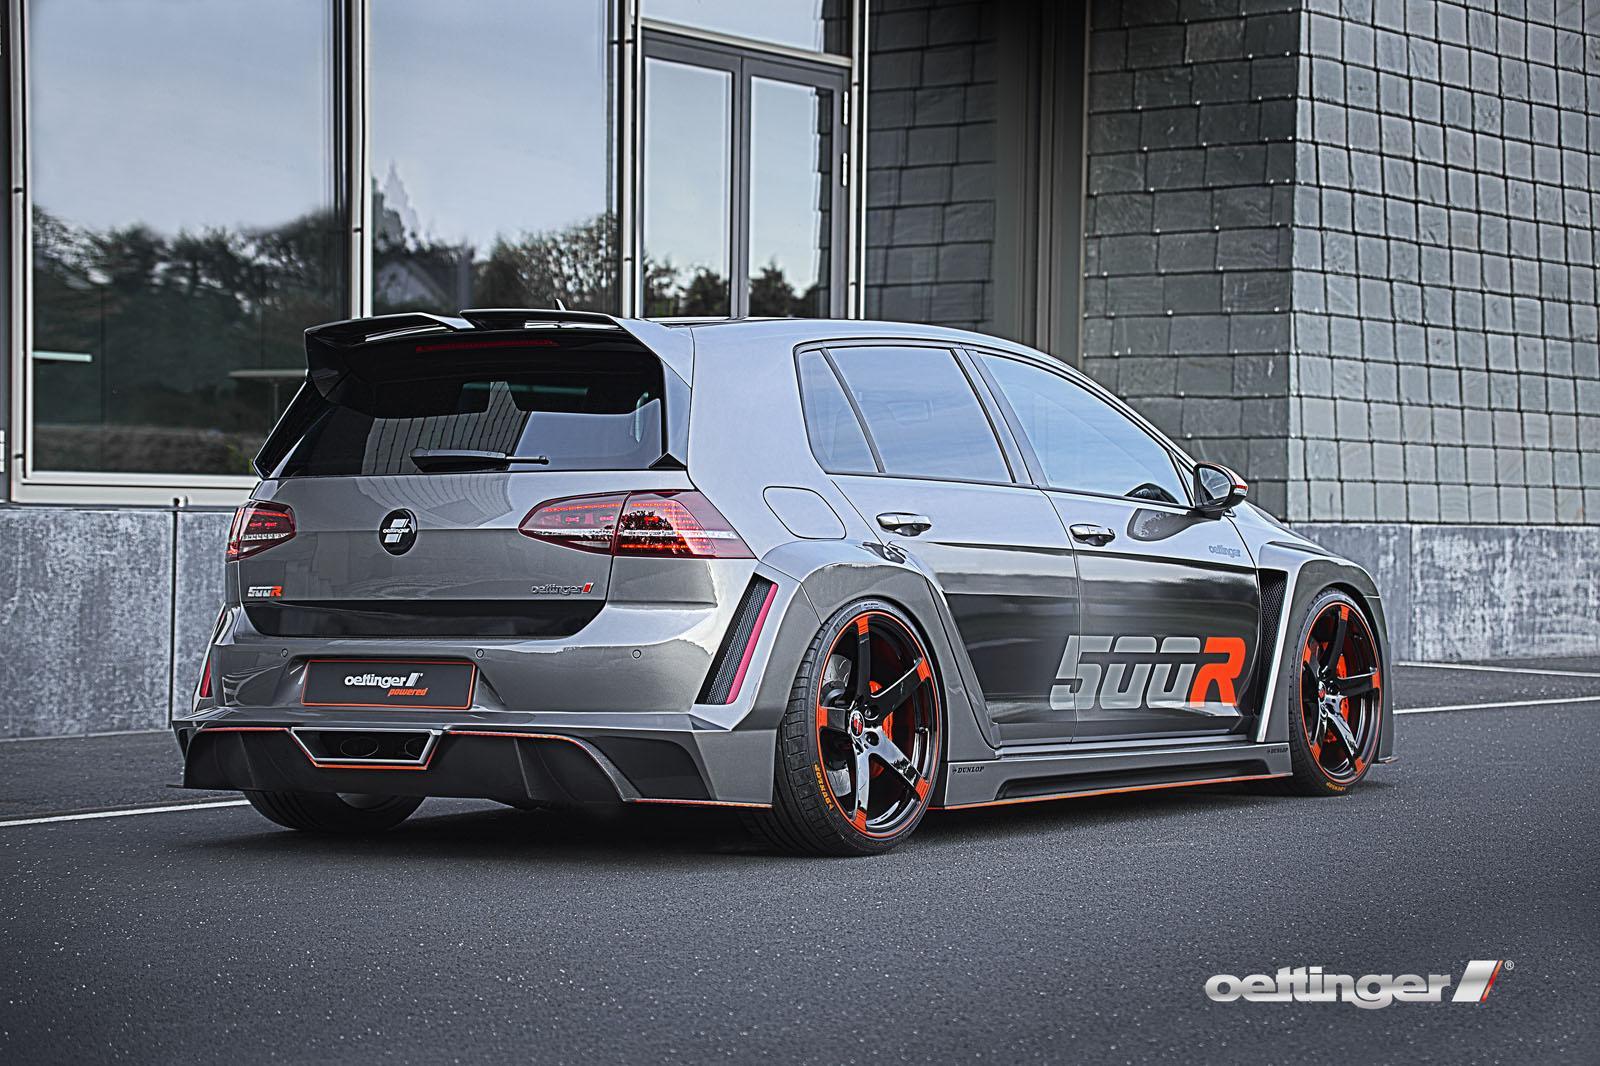 Oettinger VW Golf R500